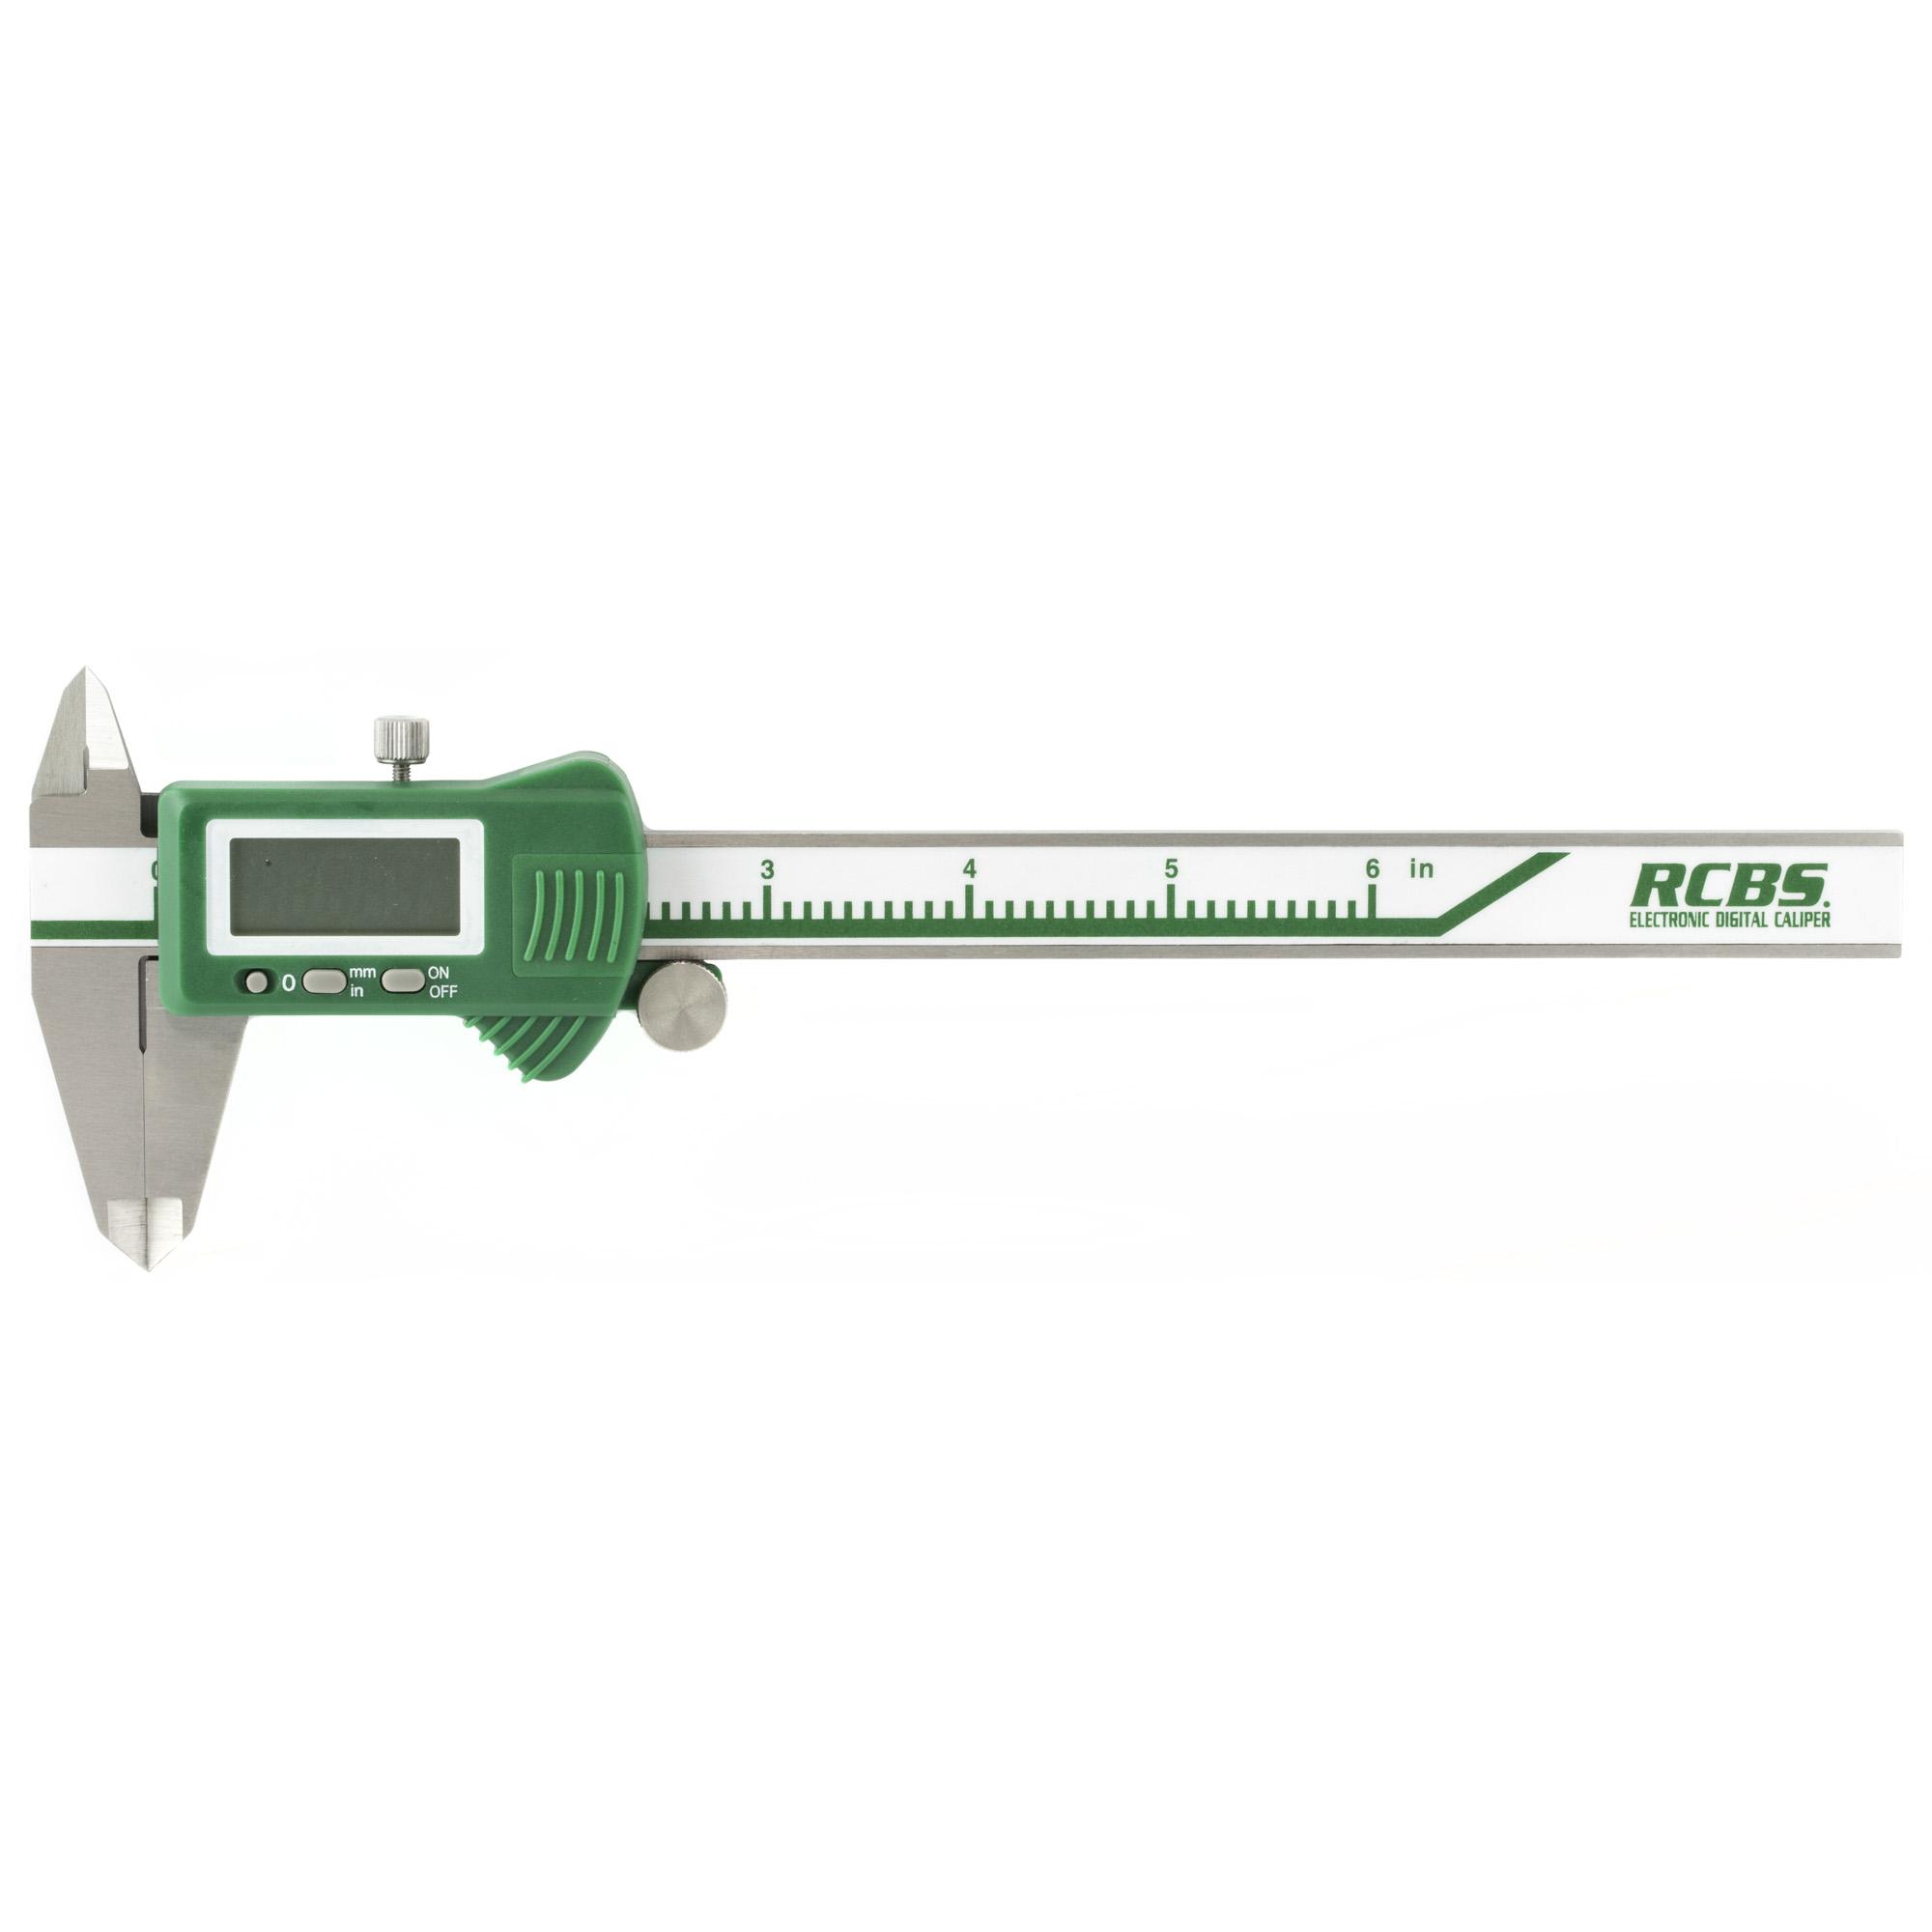 "Rcbs Electronic Digital Caliper 0-6"""